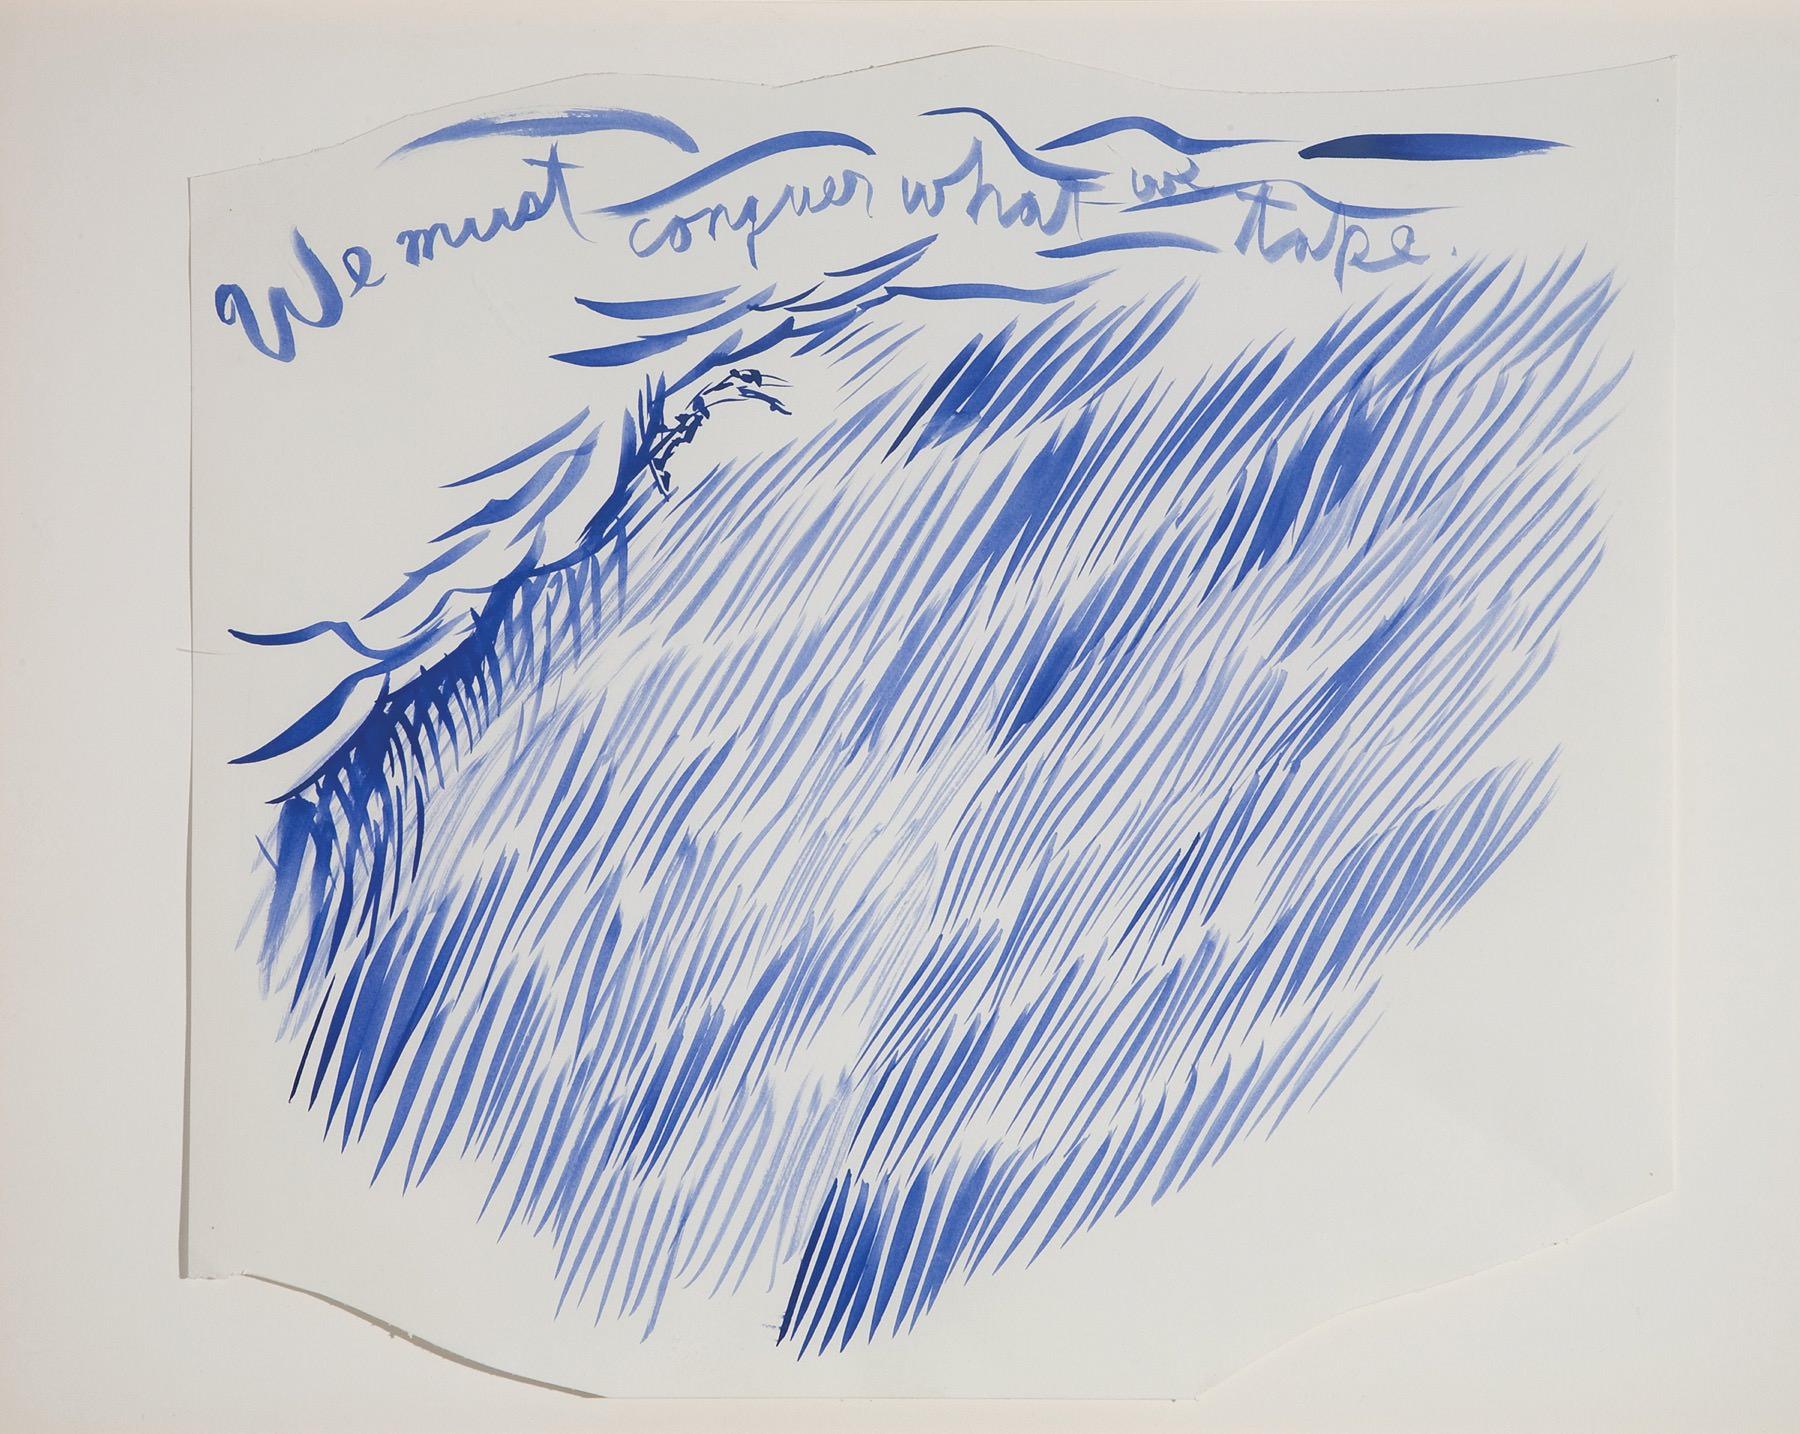 Raymond Pettibon, Untitled (We must conquer), 2003